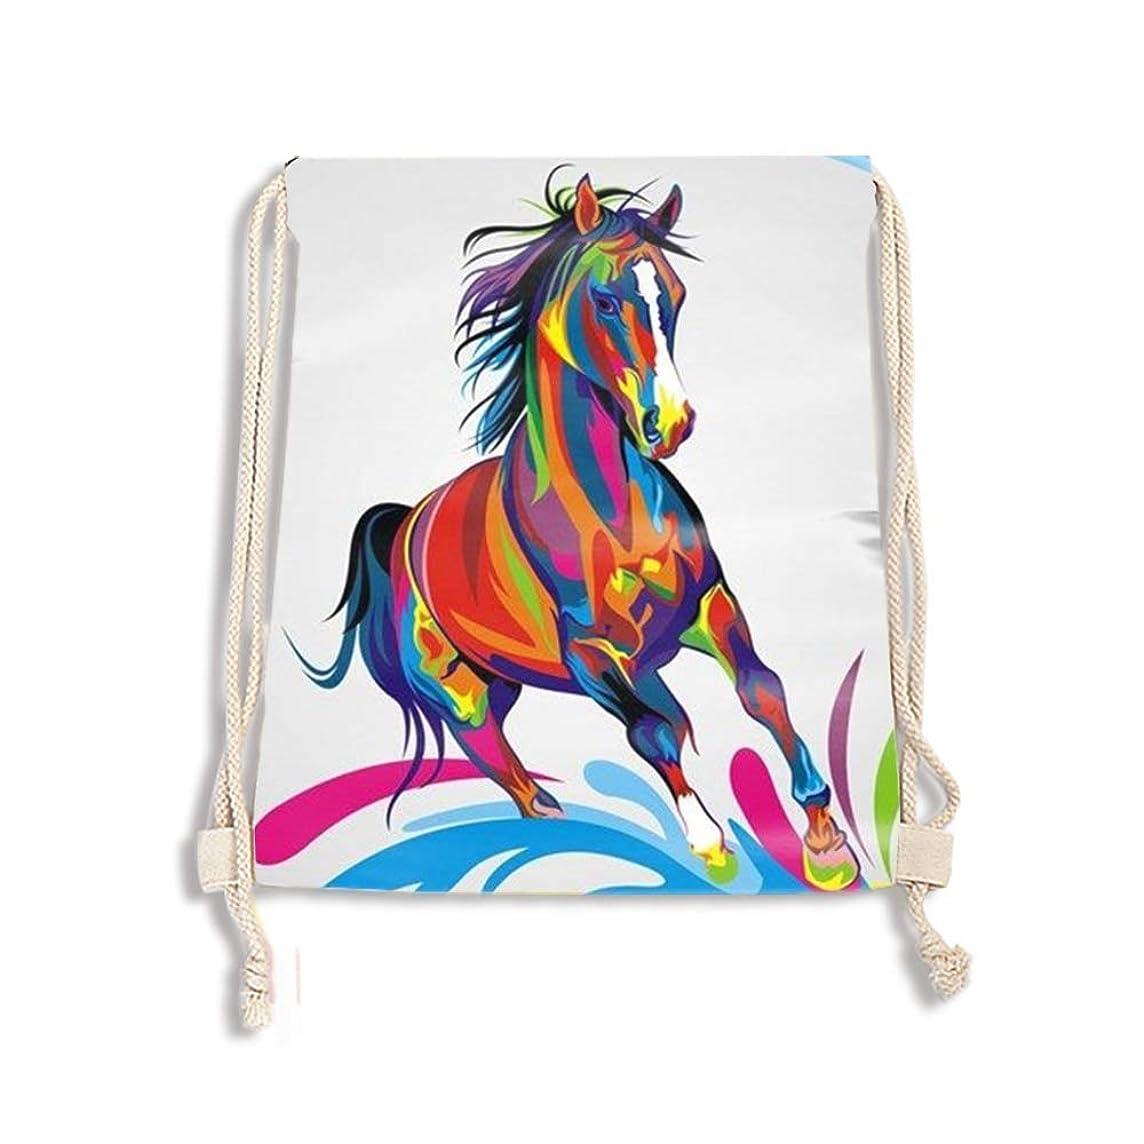 Packable Sport Gym Drawstring Sackpack Backpack Bag for Men,Women,Kids - Horse